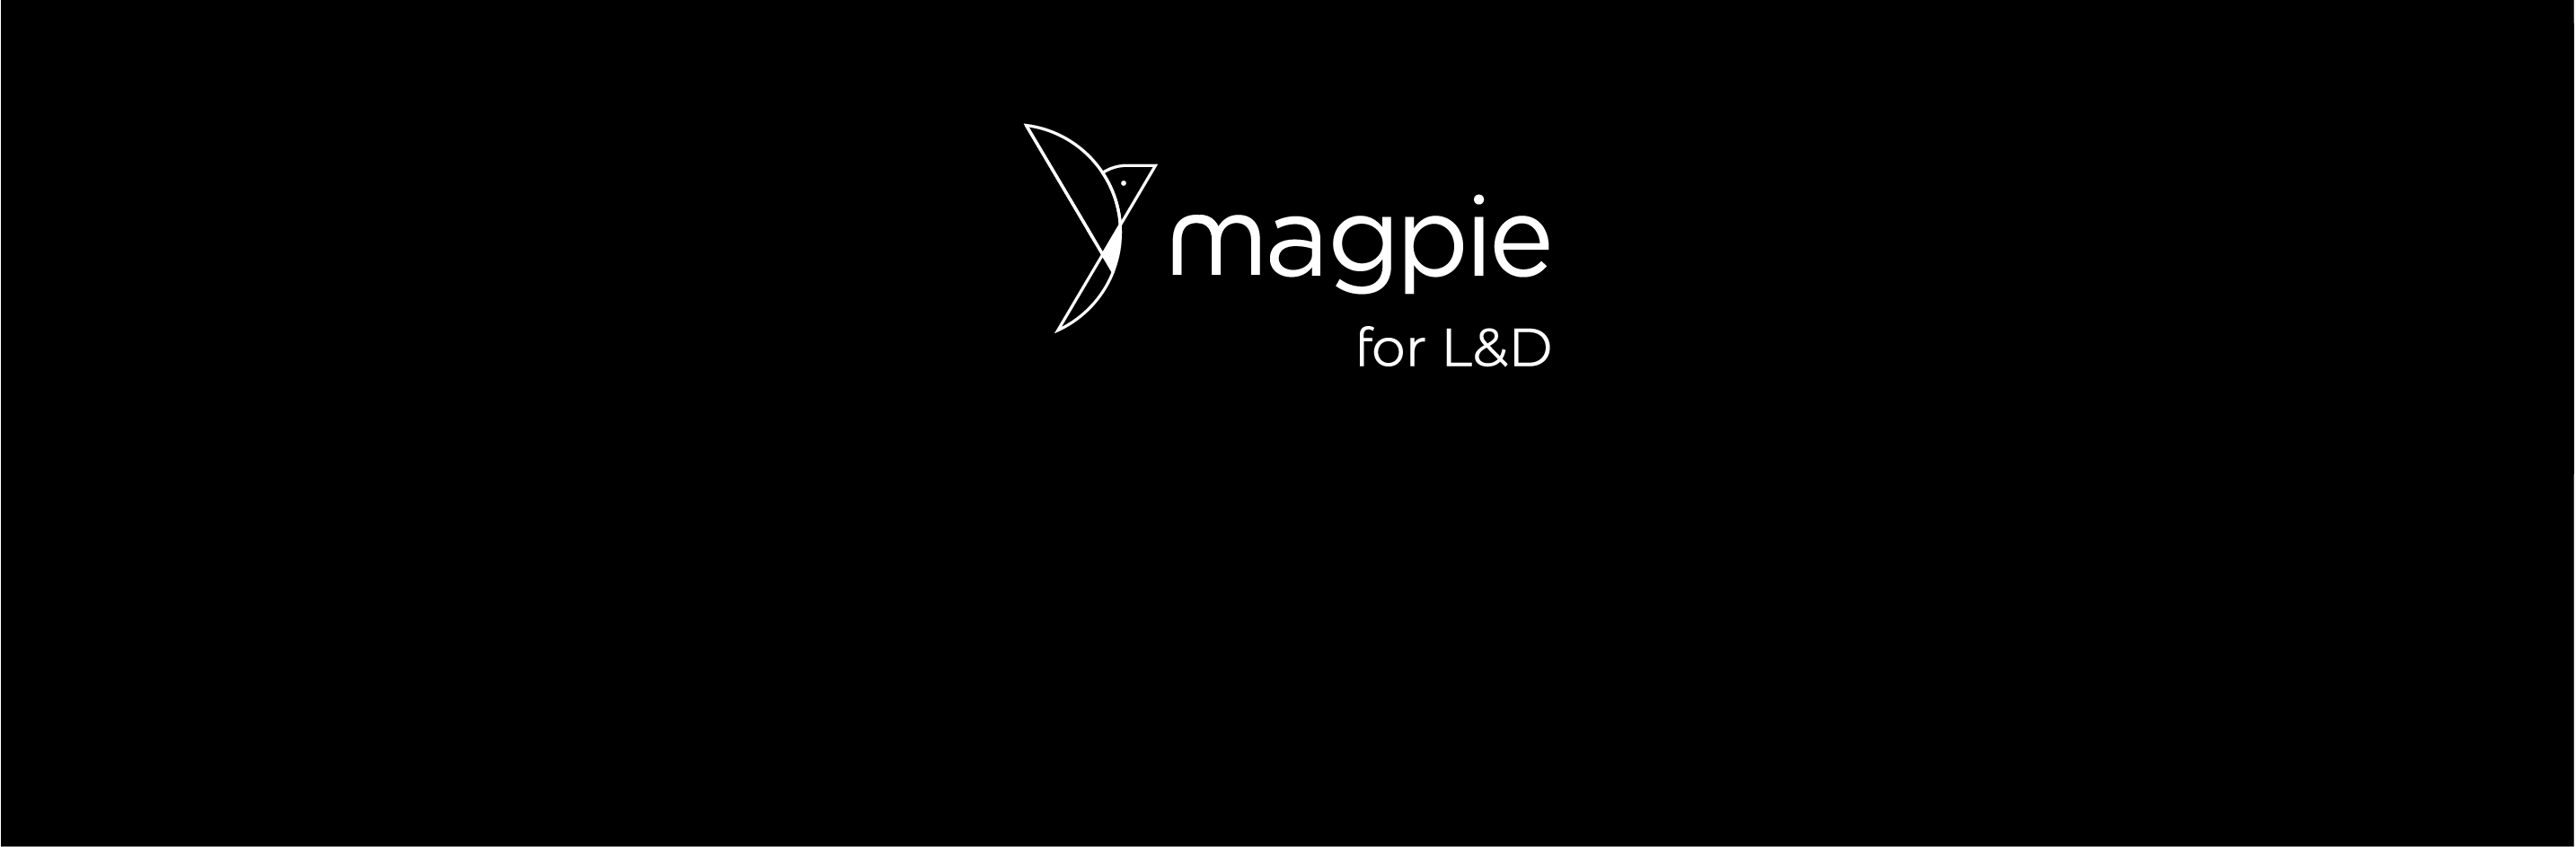 magpie for L&D cut off-01